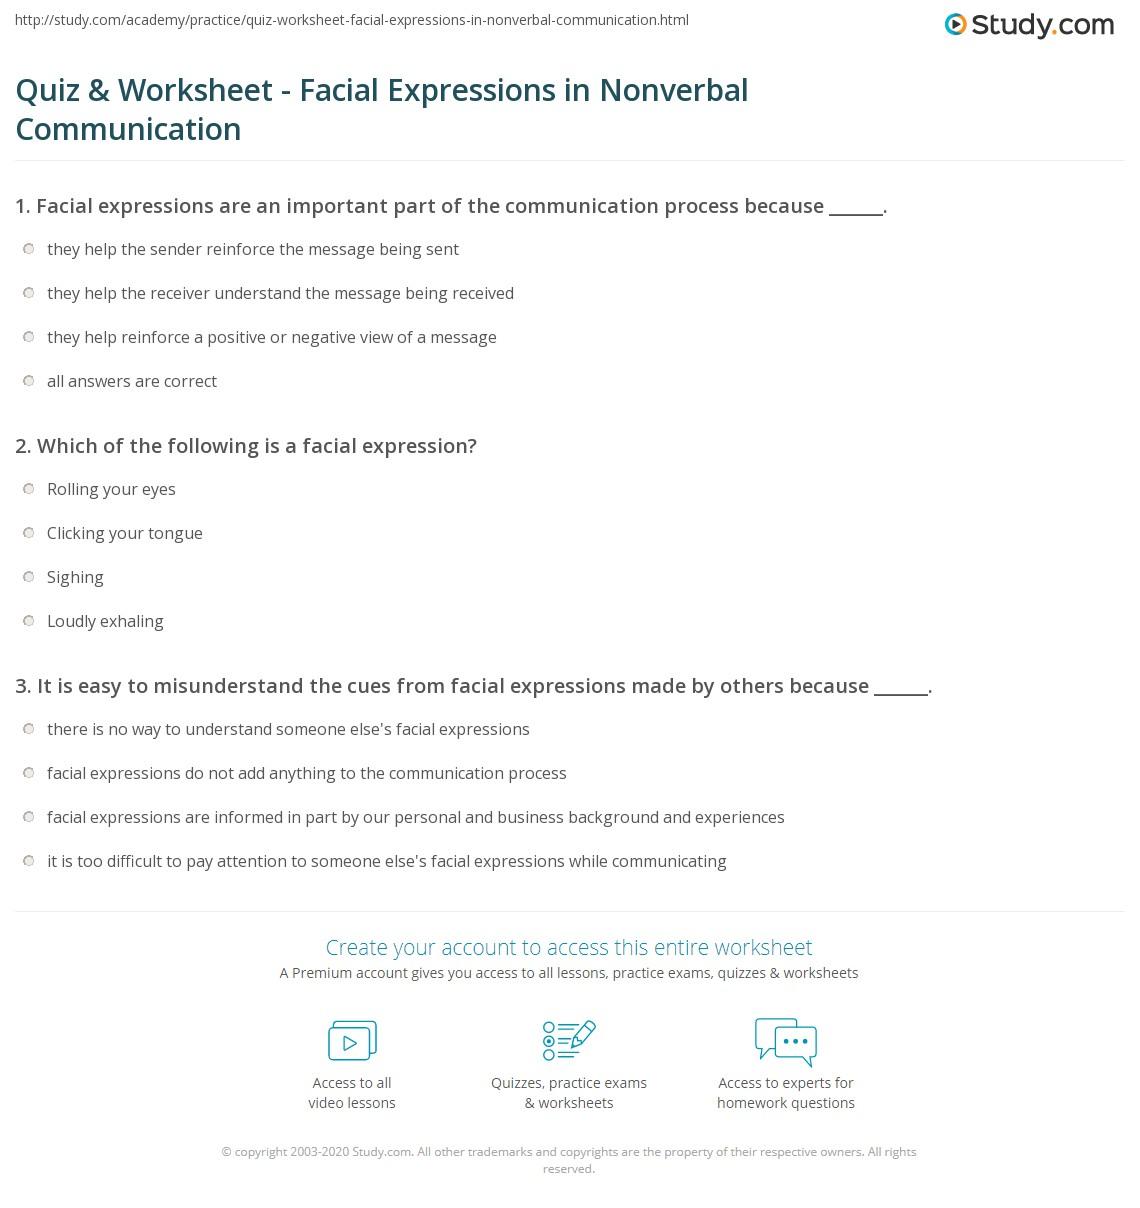 quiz worksheet facial expressions in nonverbal communication. Black Bedroom Furniture Sets. Home Design Ideas